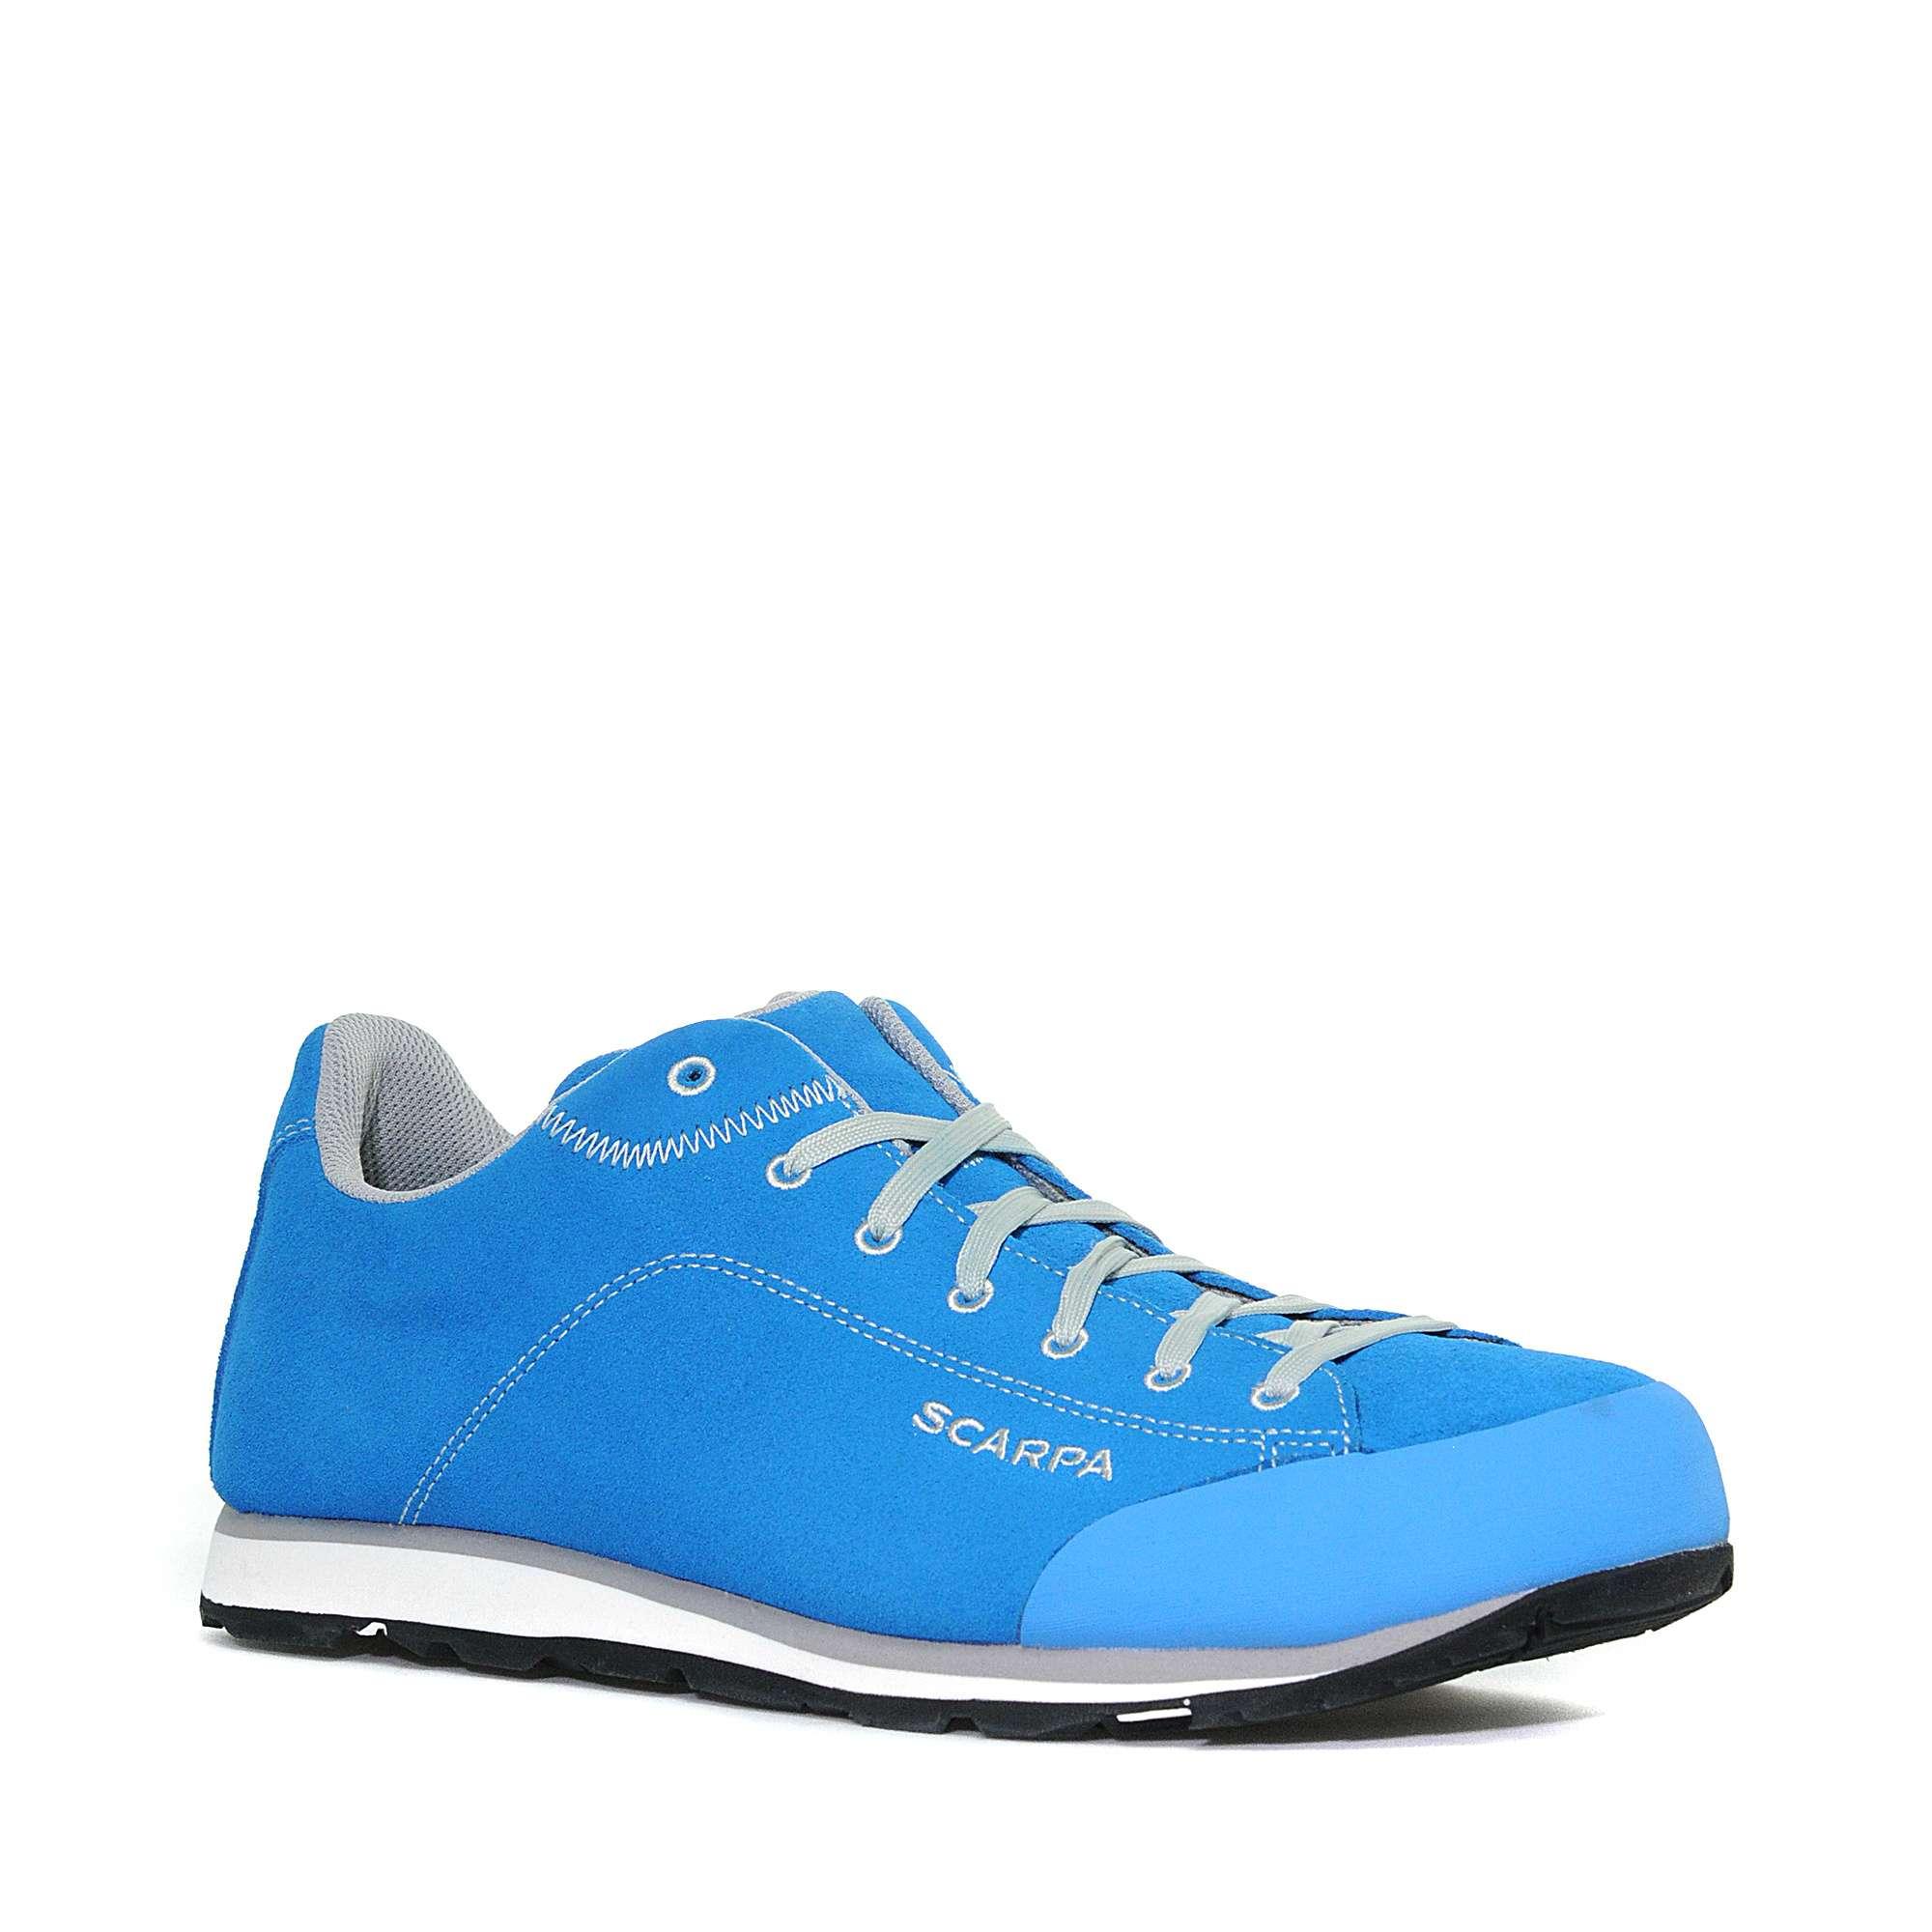 SCARPA Men's Margarita Casual Shoe